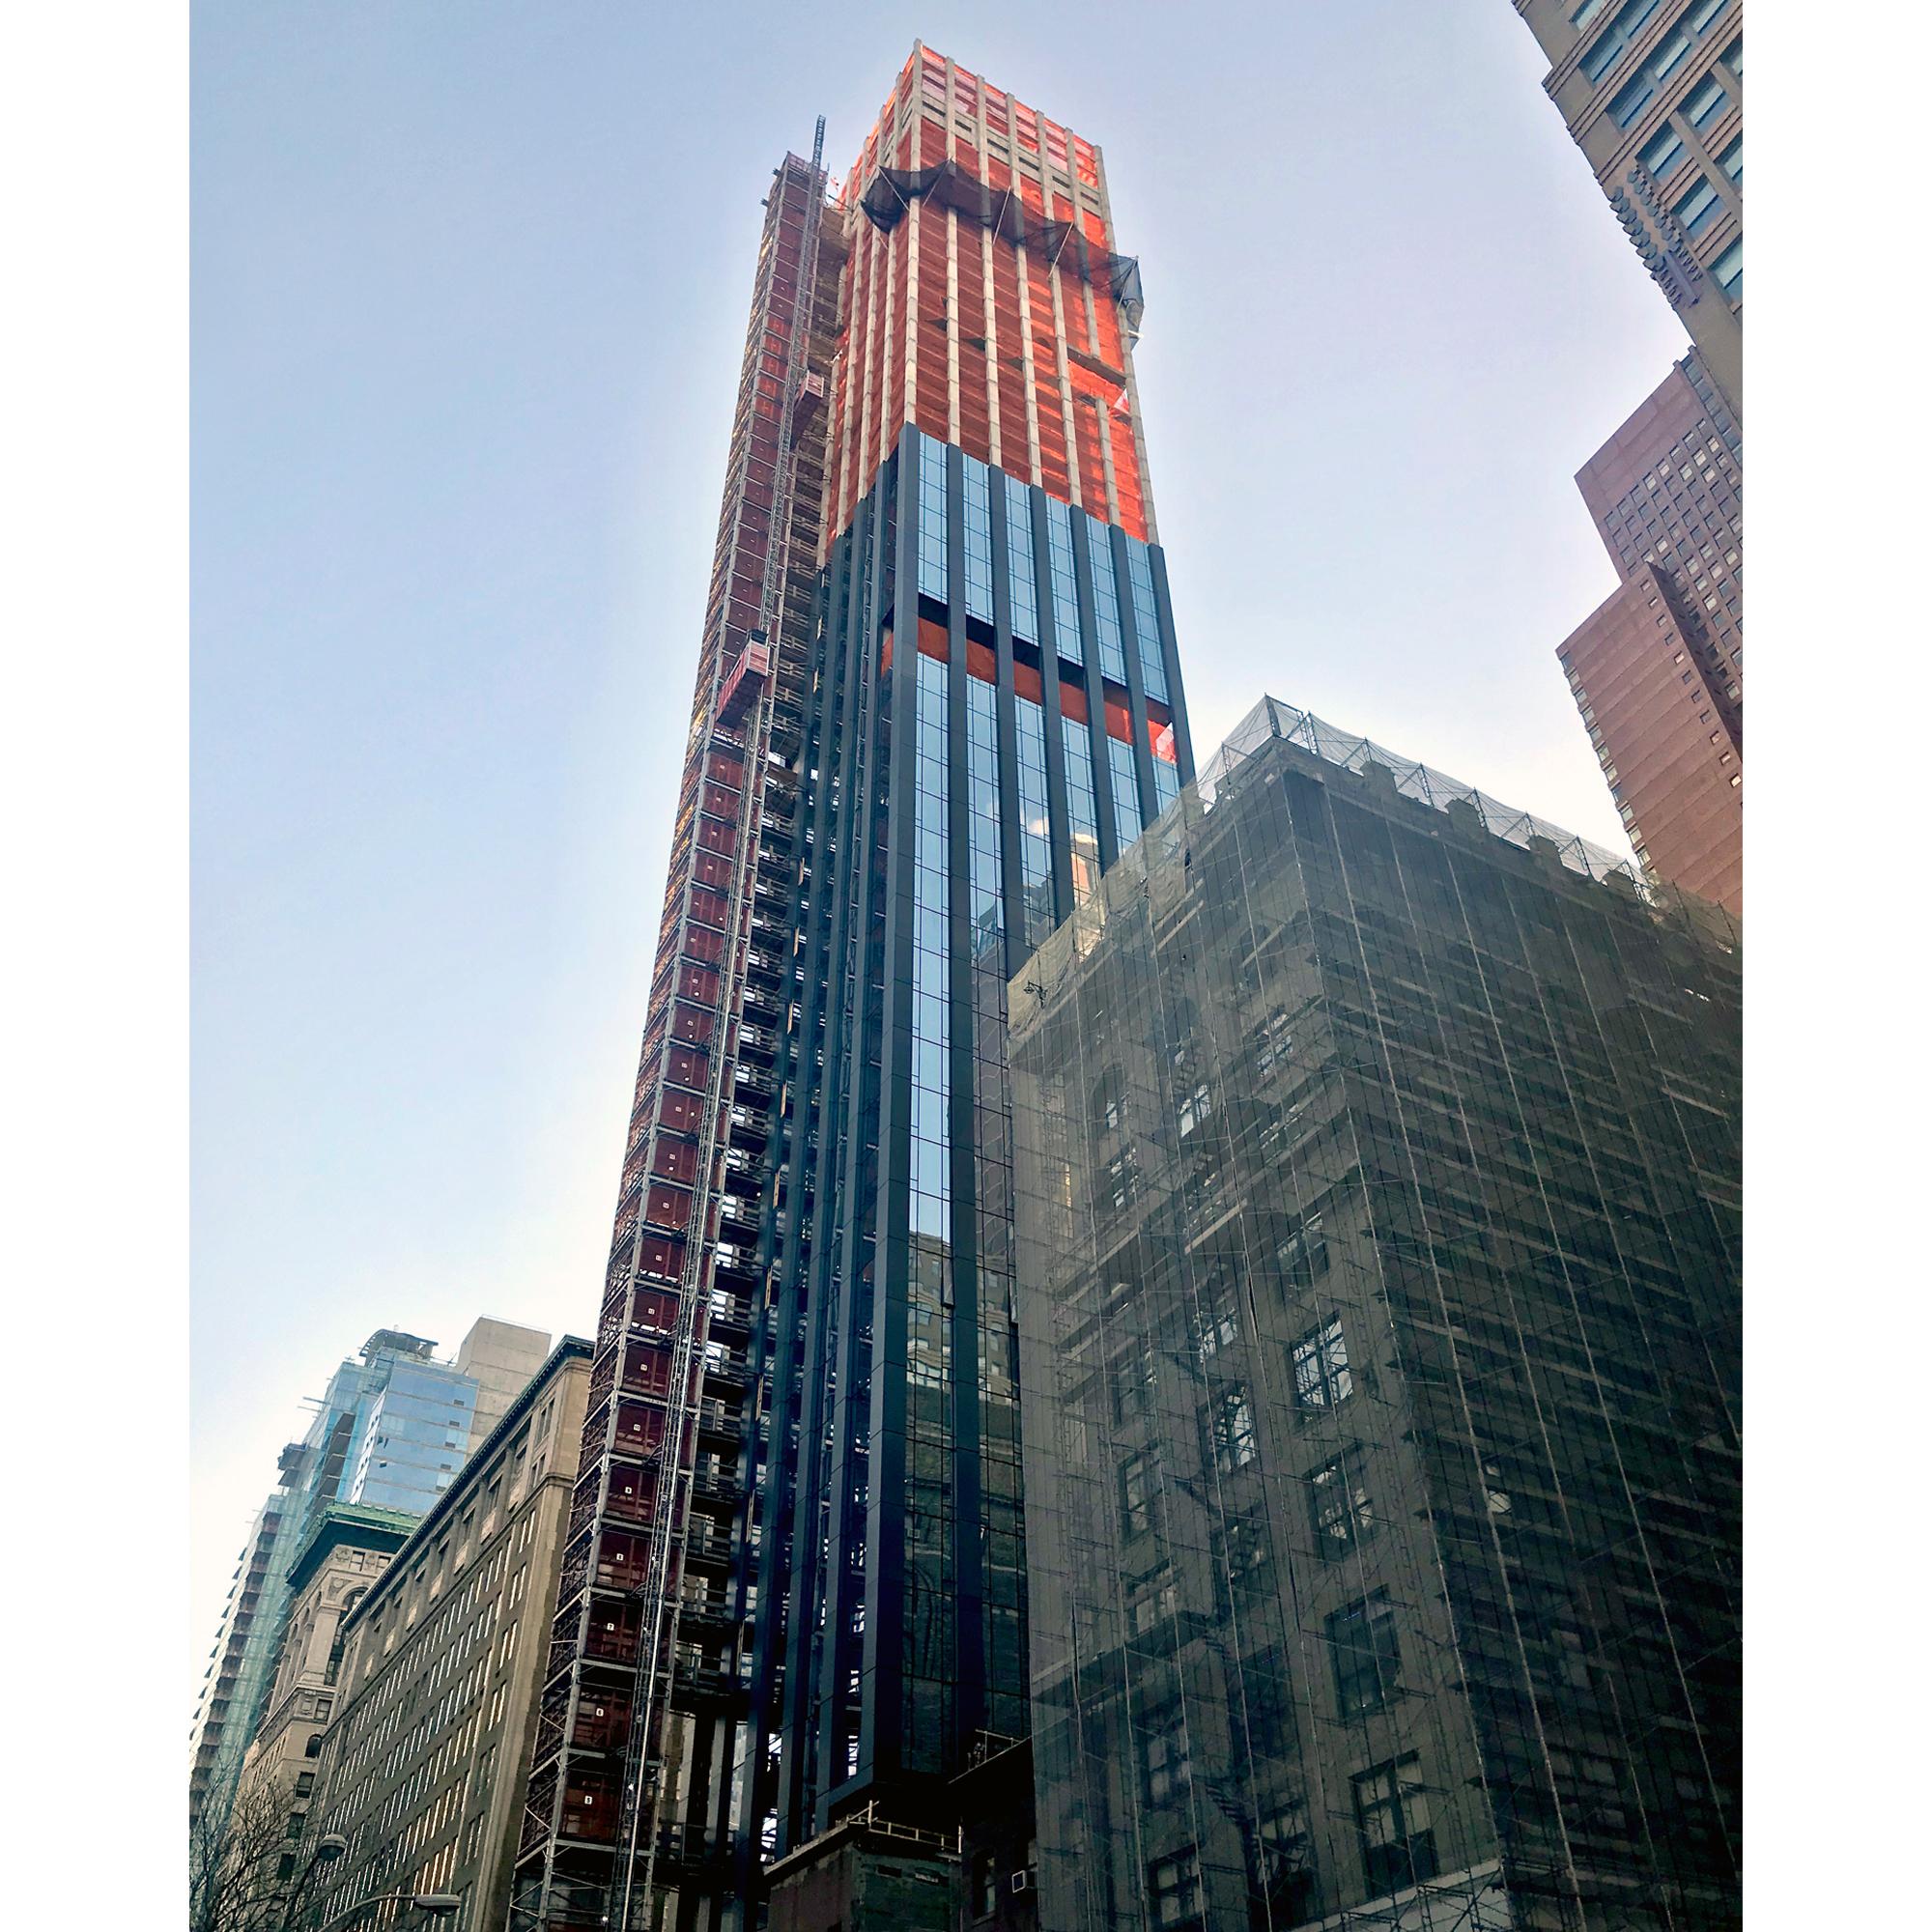 281 Fifth Avenue